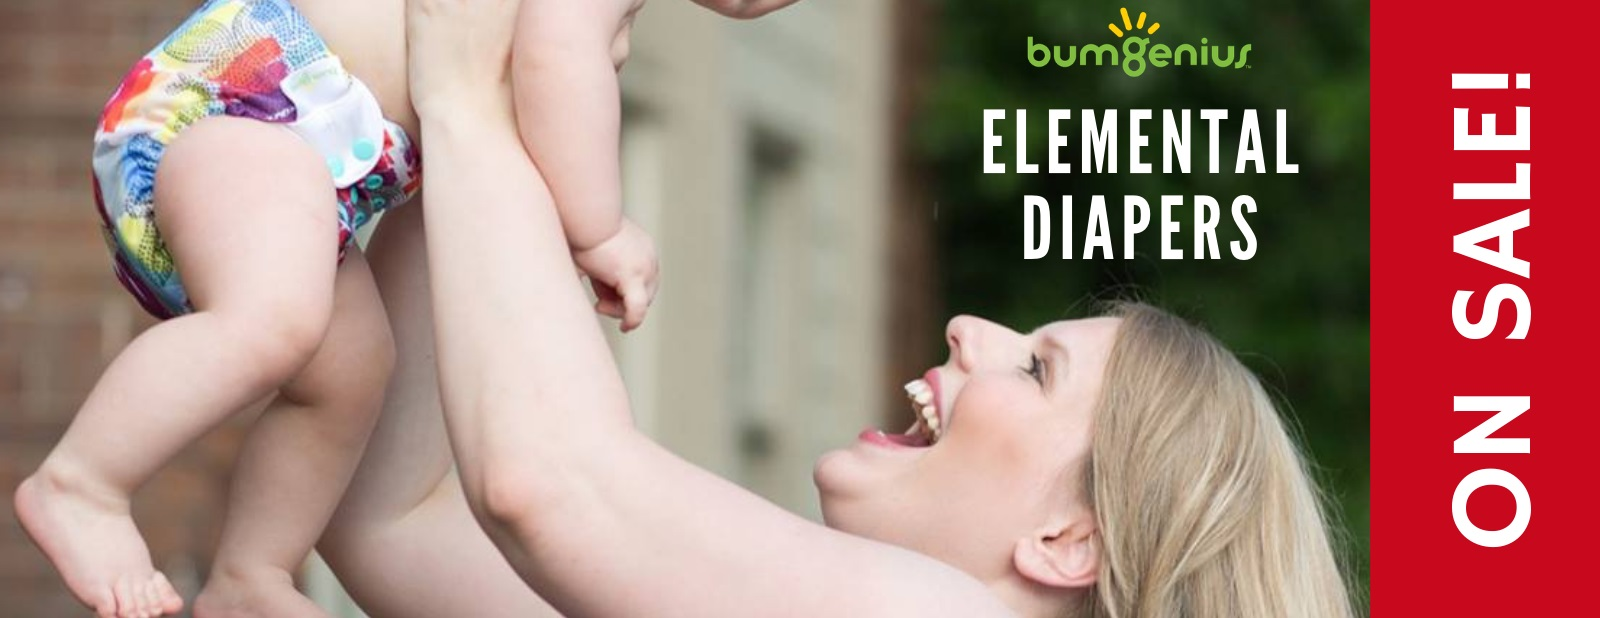 bumgenius elemental cloth diaper sale